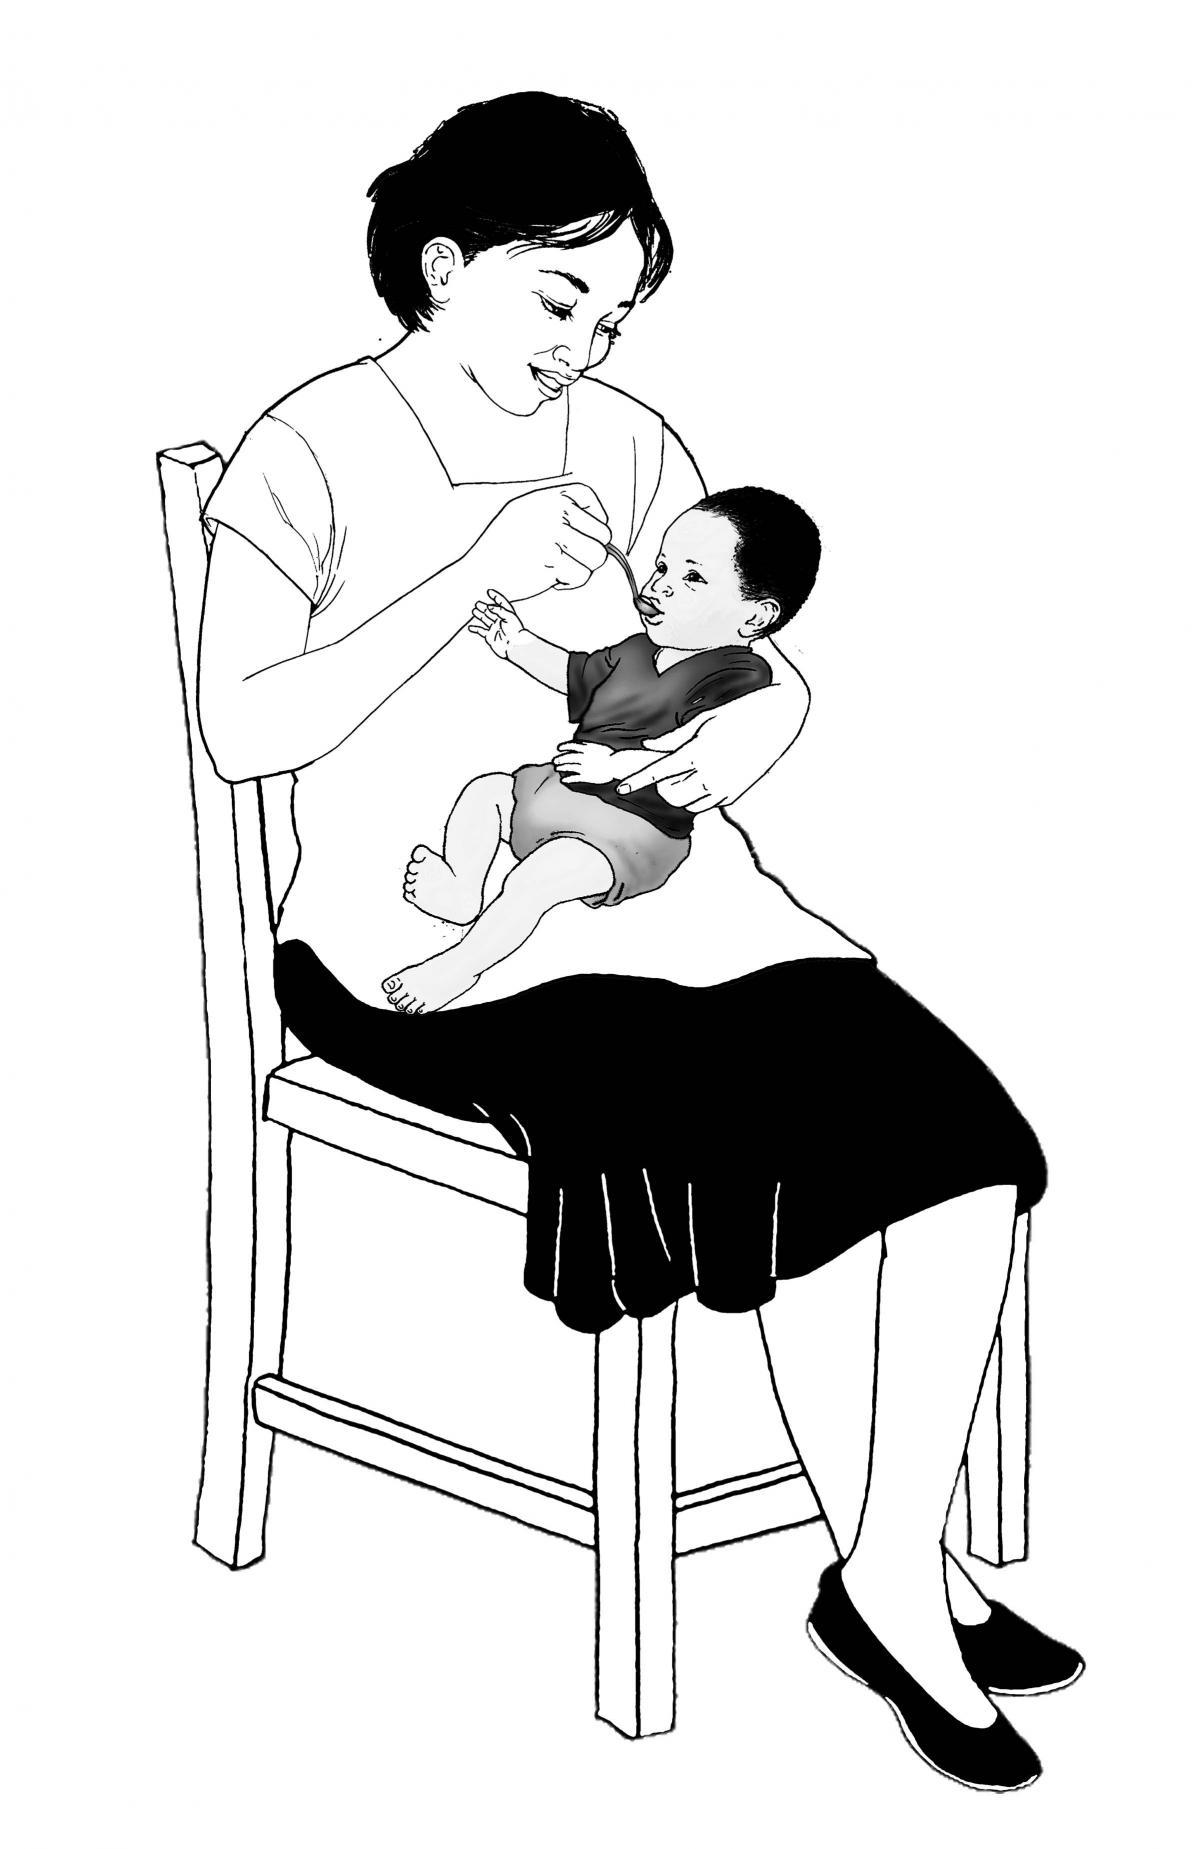 Complementary Feeding - Complementary Feeding 6-12 months 6-24 mo - 00 - Non-country specific